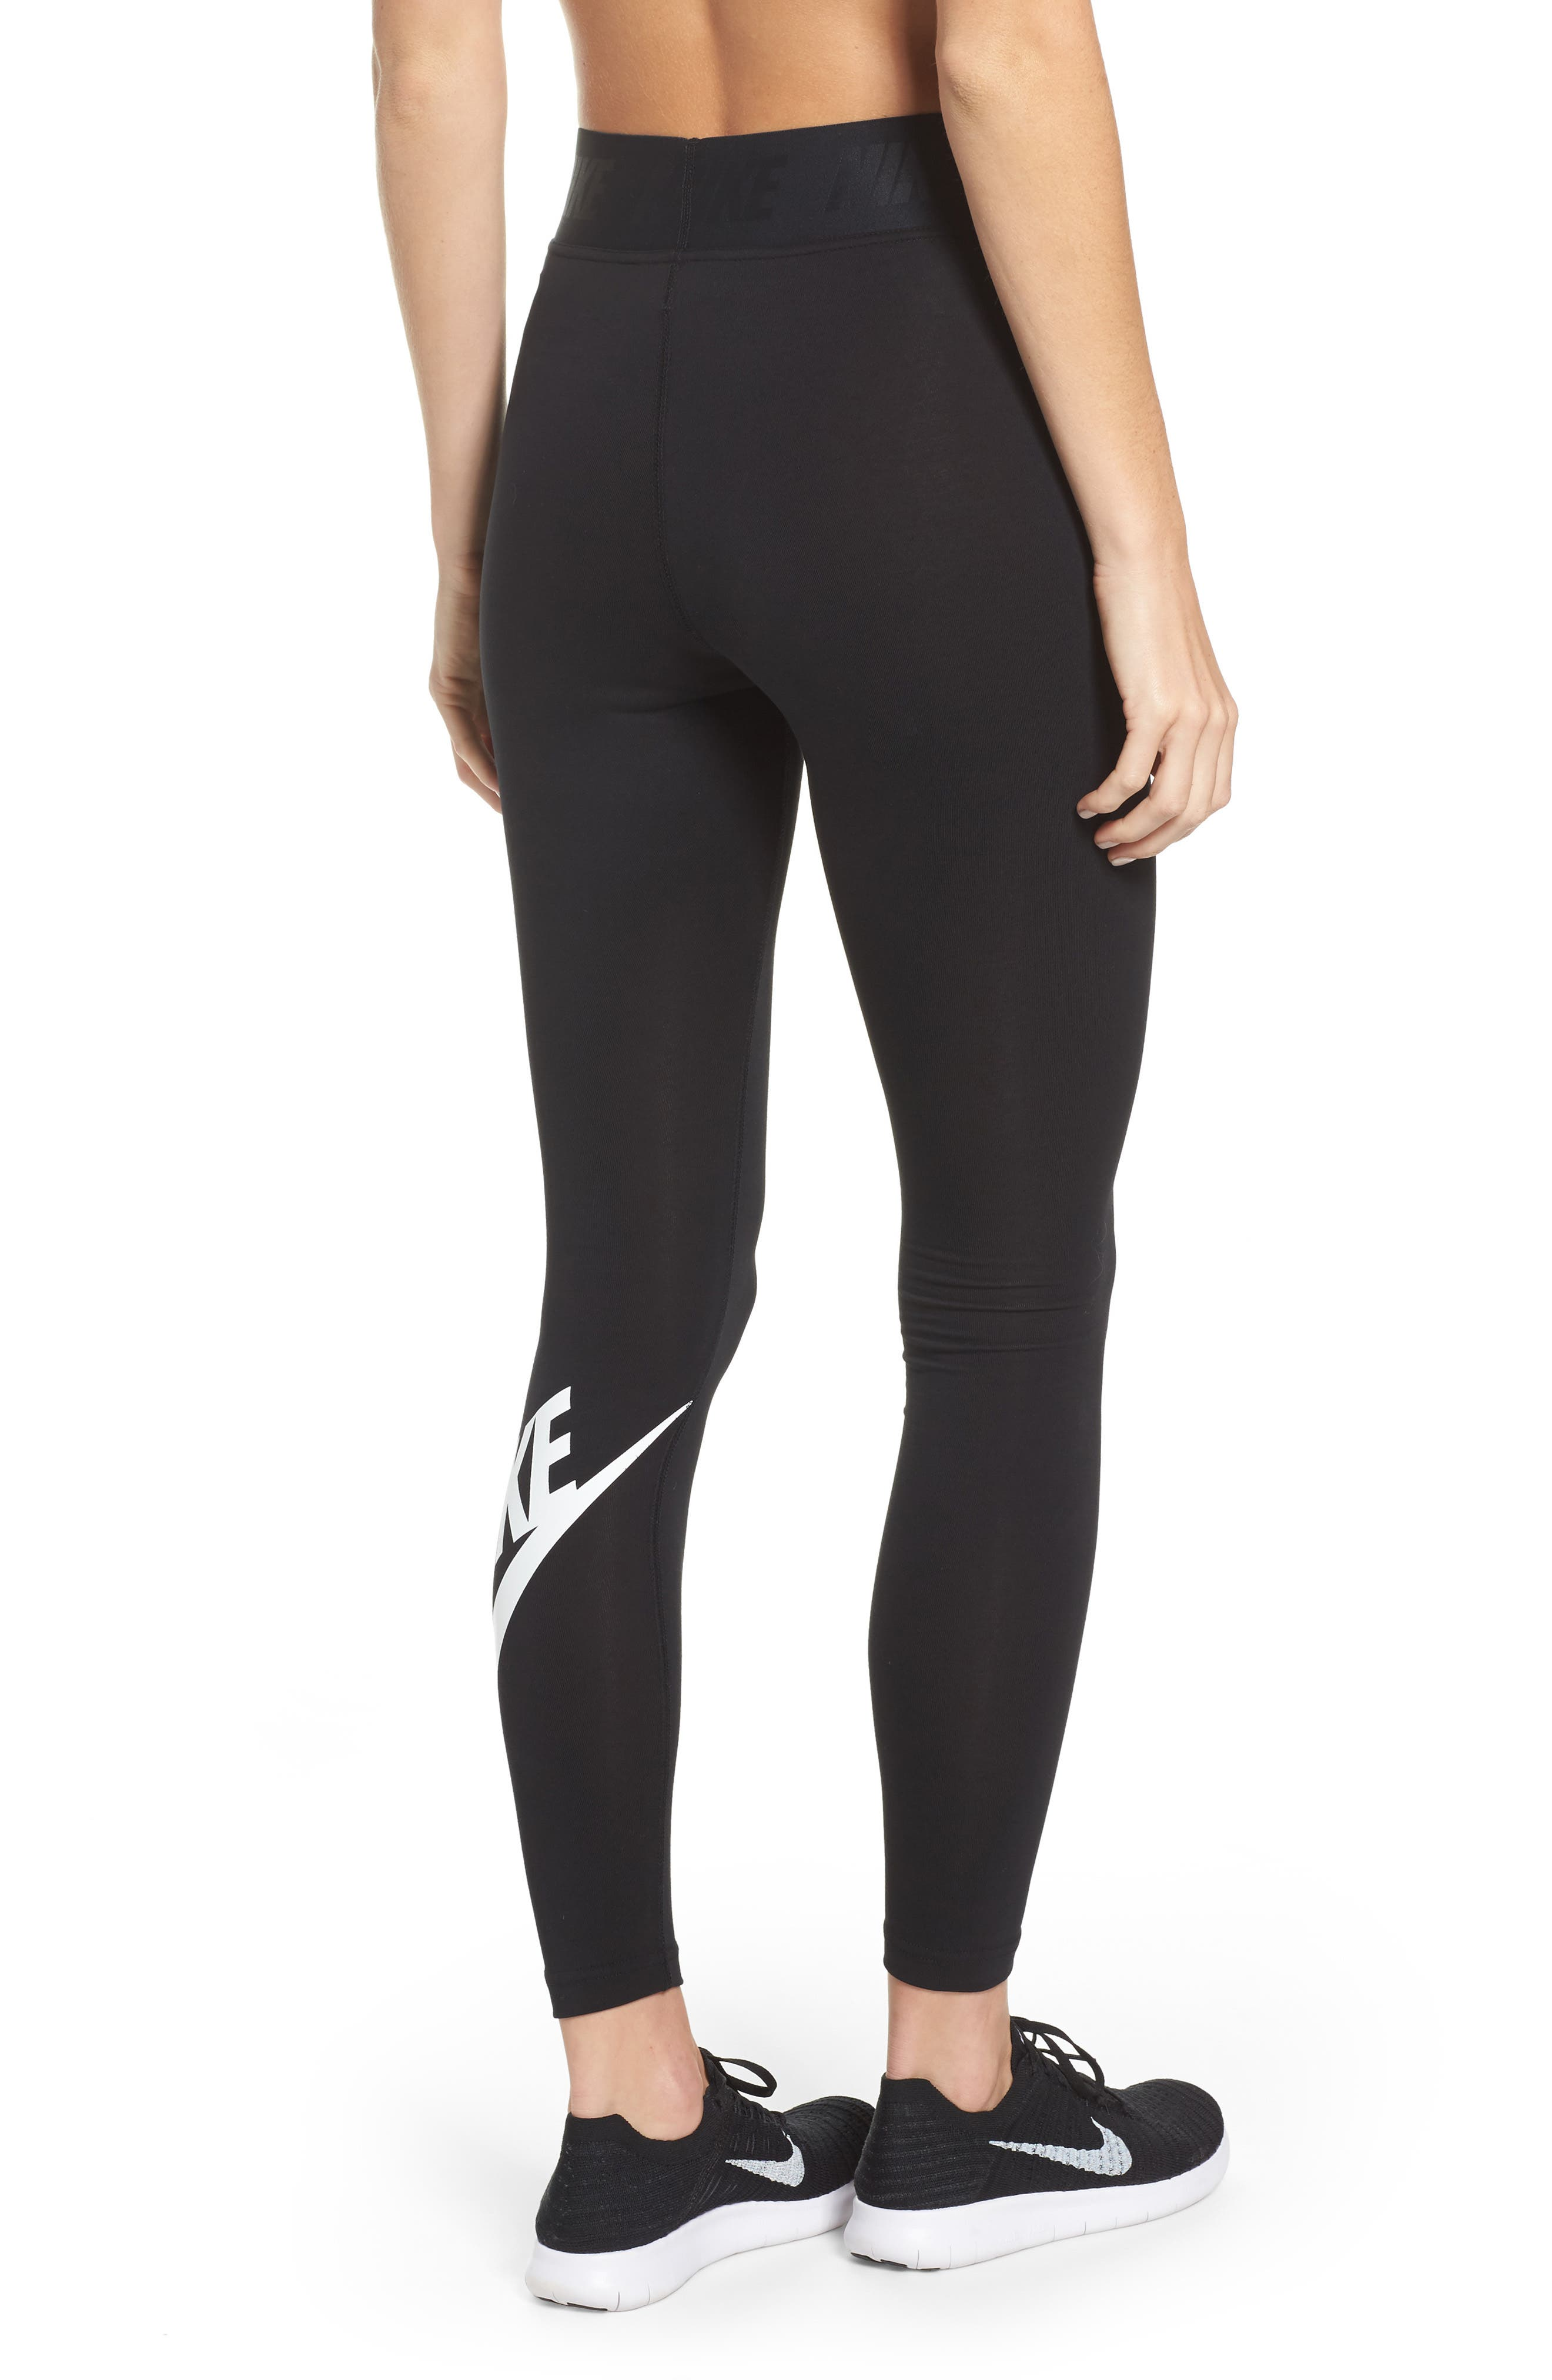 Leg-a-See High Waist Leggings,                             Alternate thumbnail 2, color,                             Black/ White